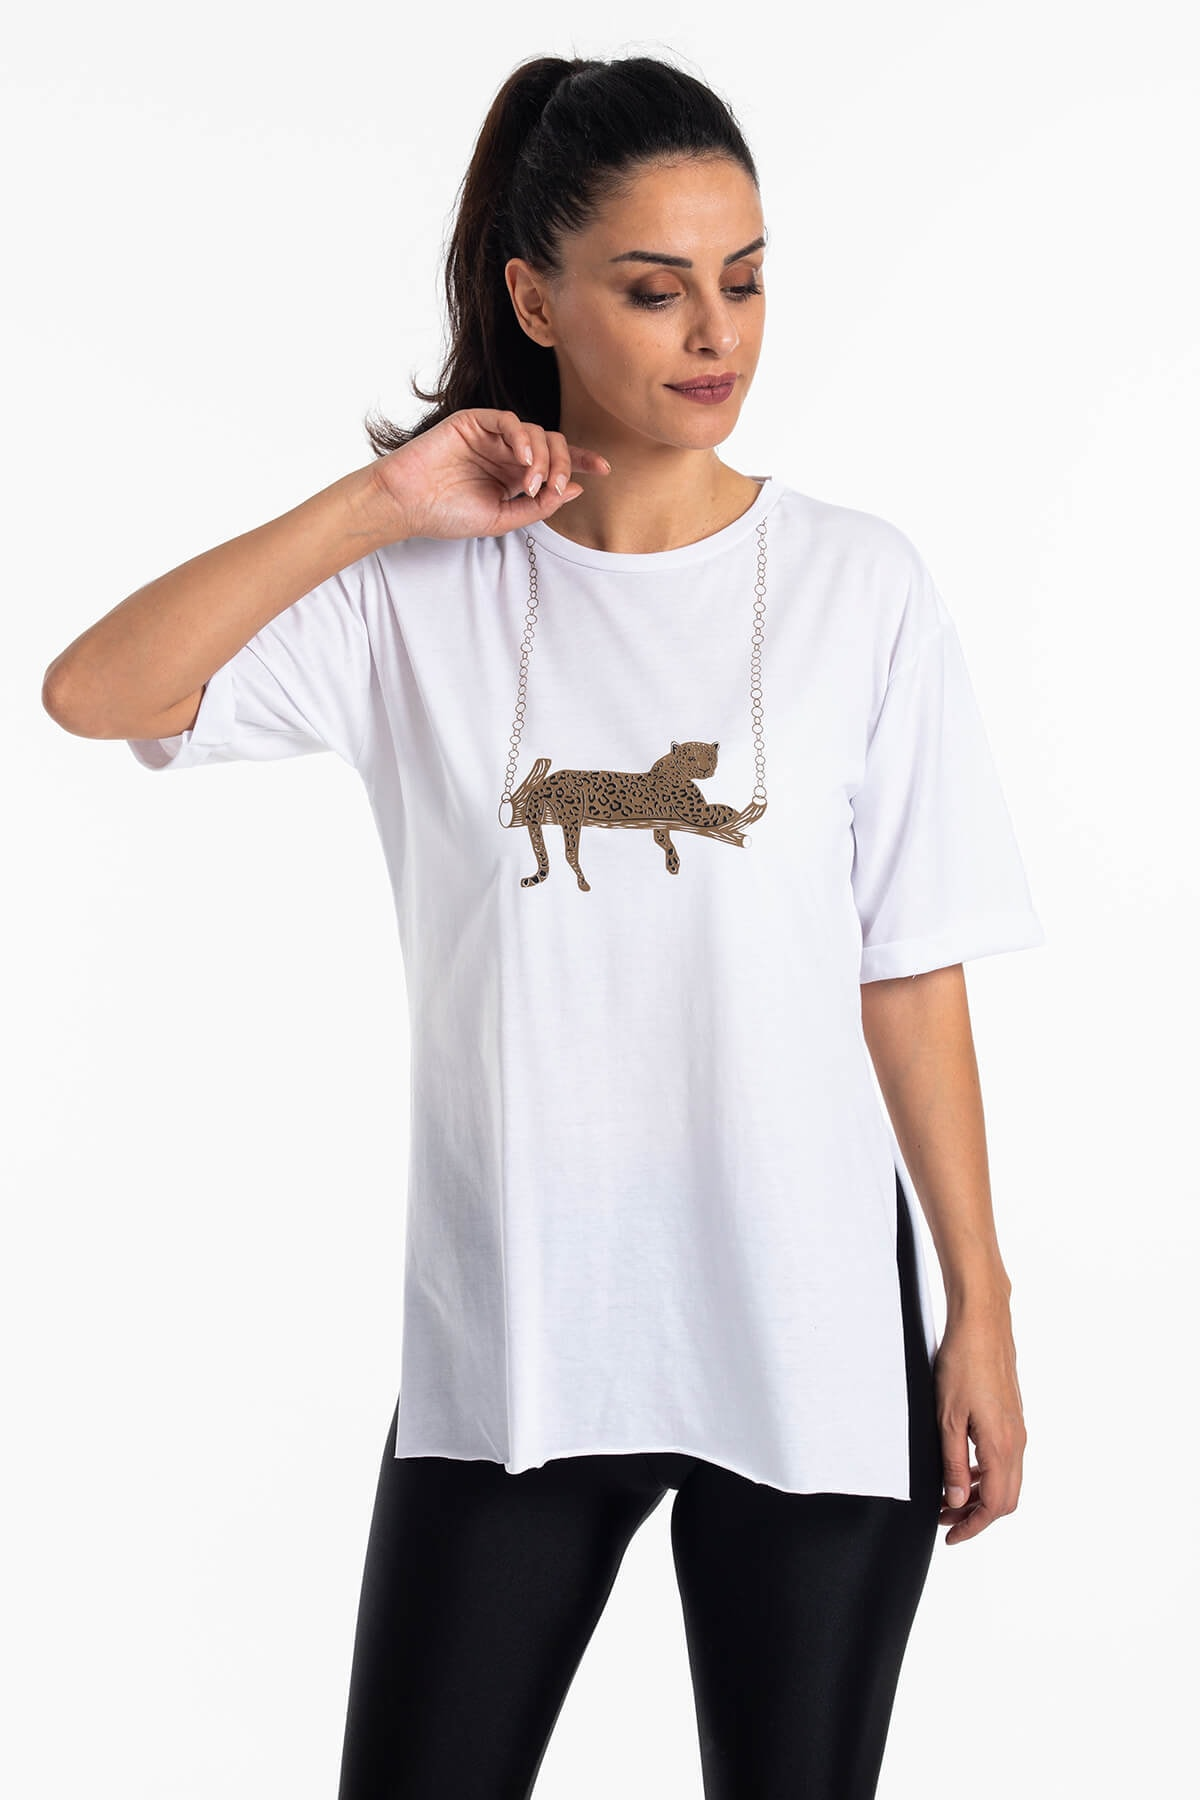 Mossta Kadın Beyaz Yırtmaçlı Salaş T-shirt 1